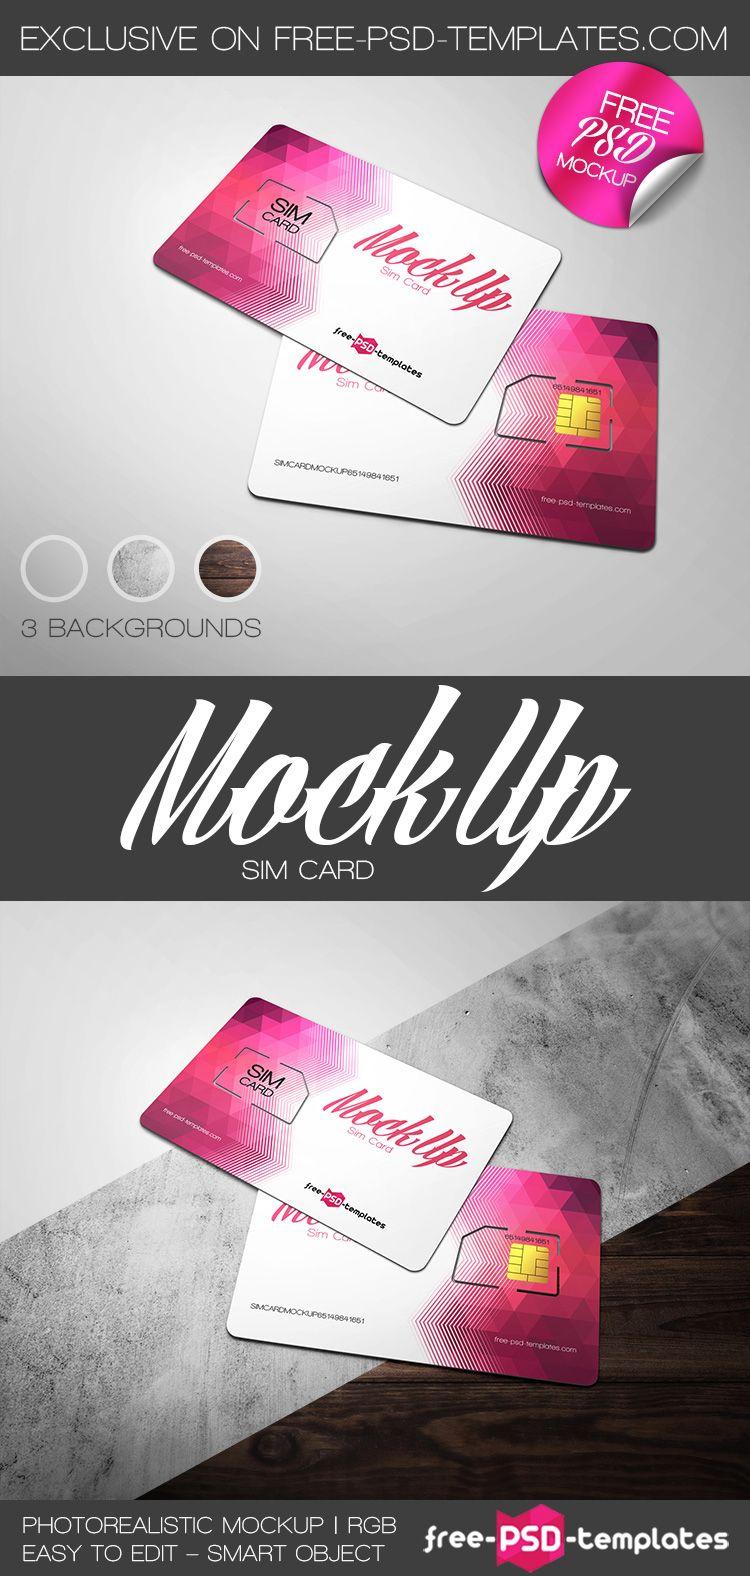 Free Sim Card Mockup PSD Free PSD Templates free